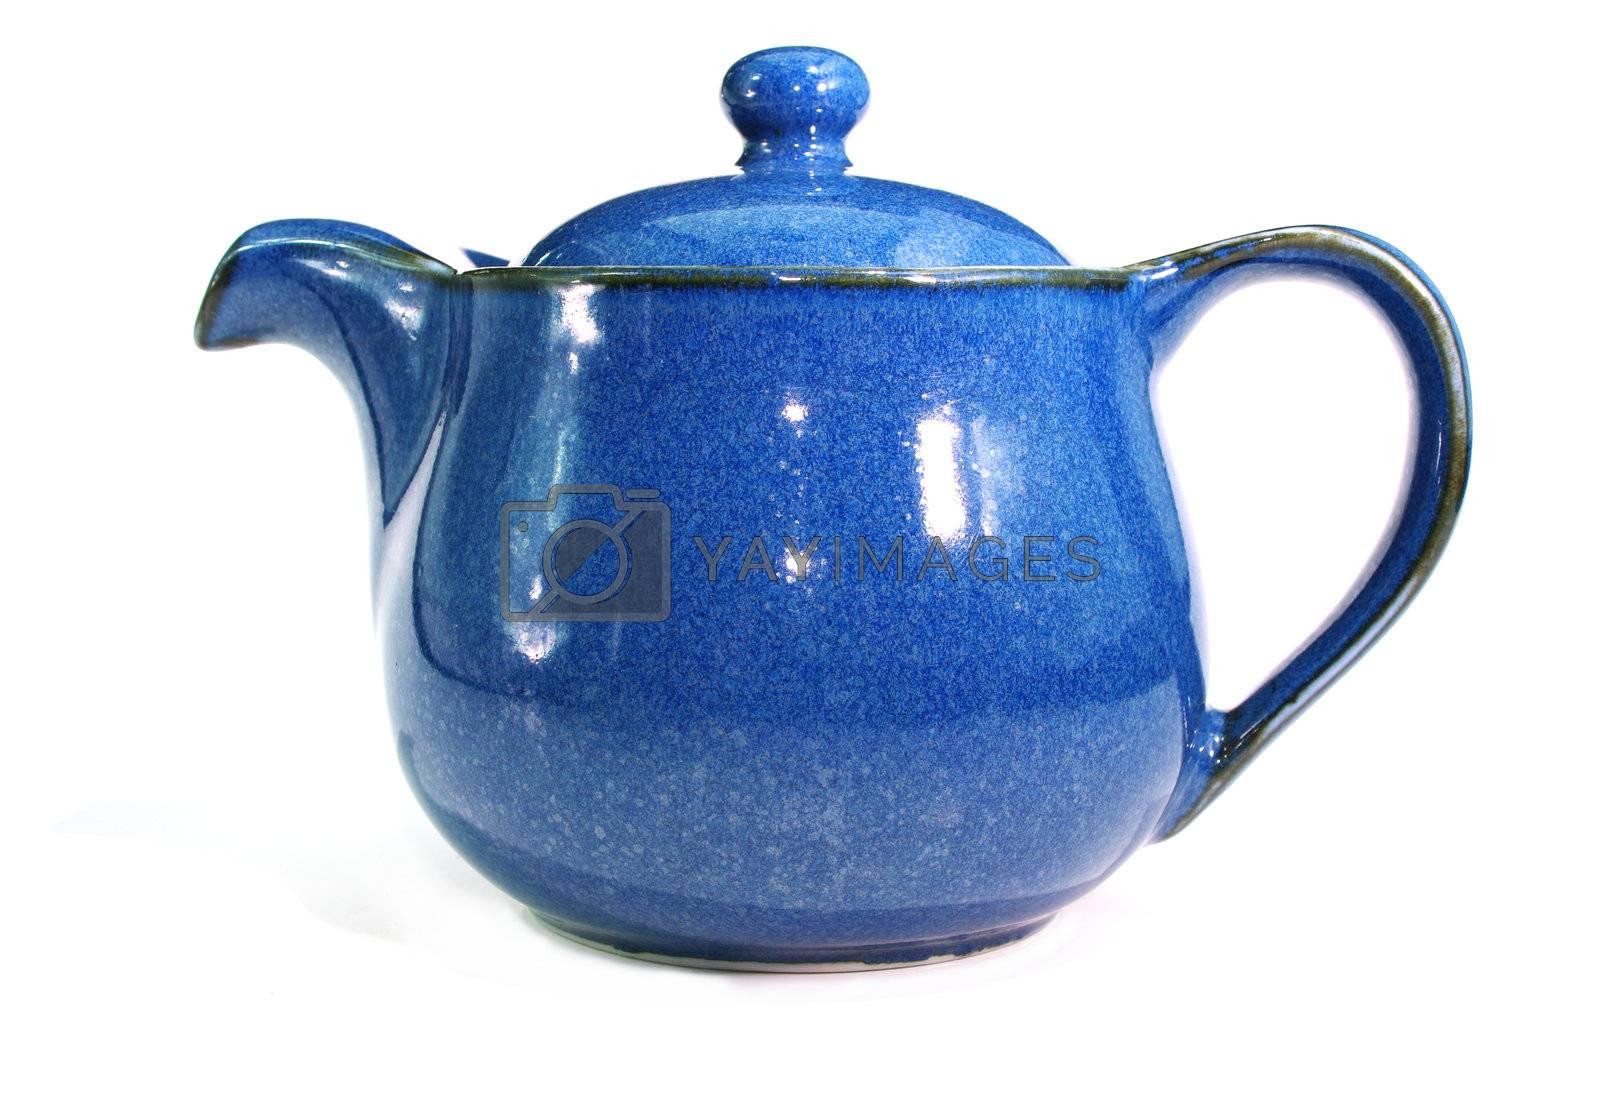 teapot by openyouraperture